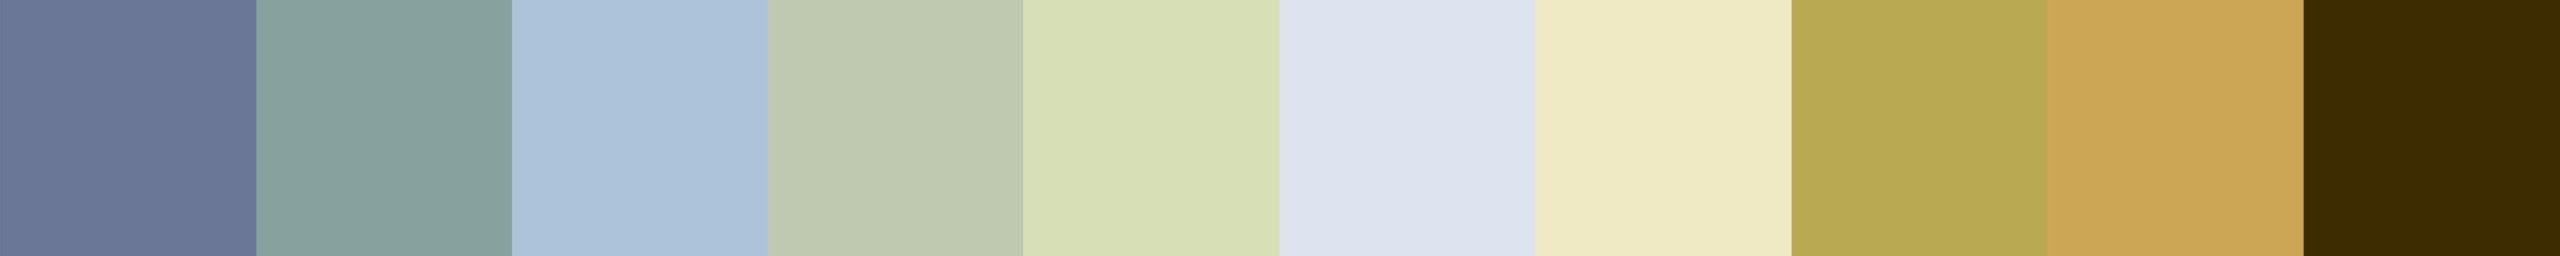 281 Antedafia Color Palette